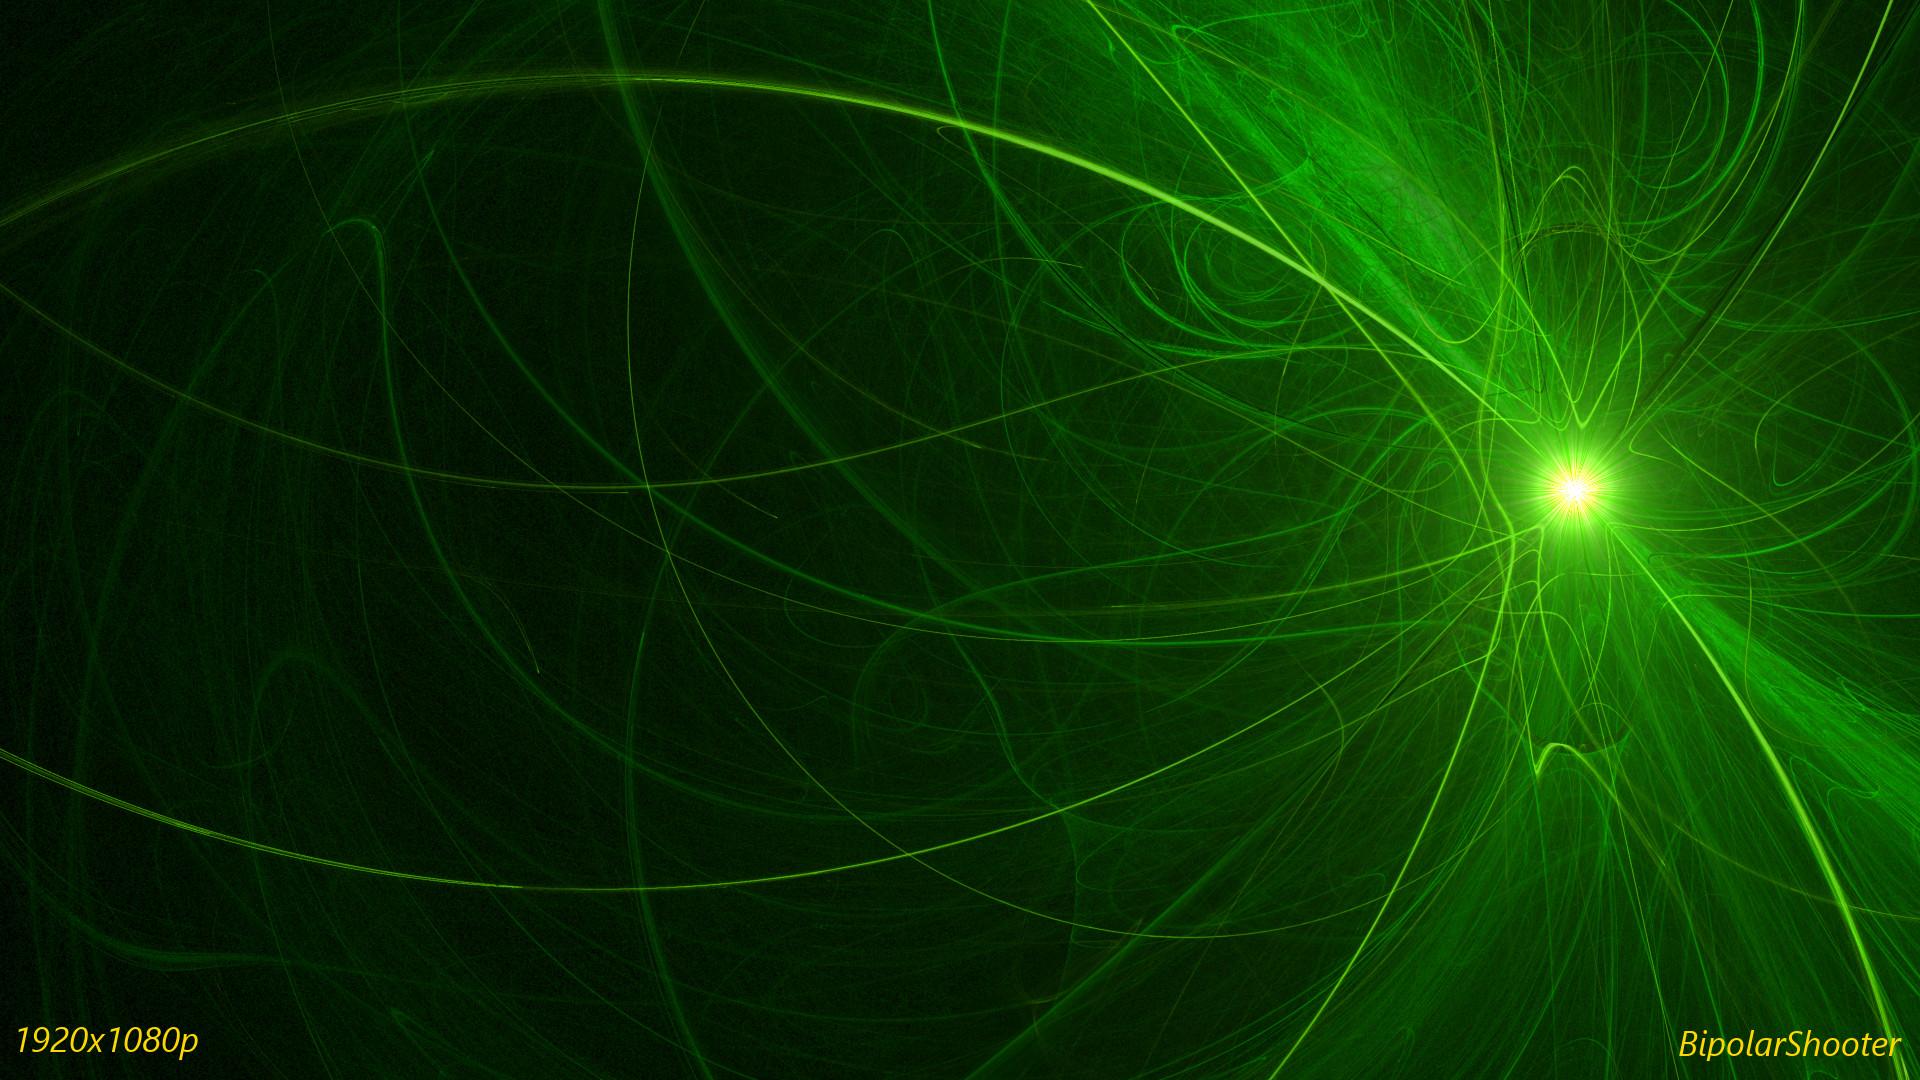 1920x1080 File Emerald Green 100 Quality HD